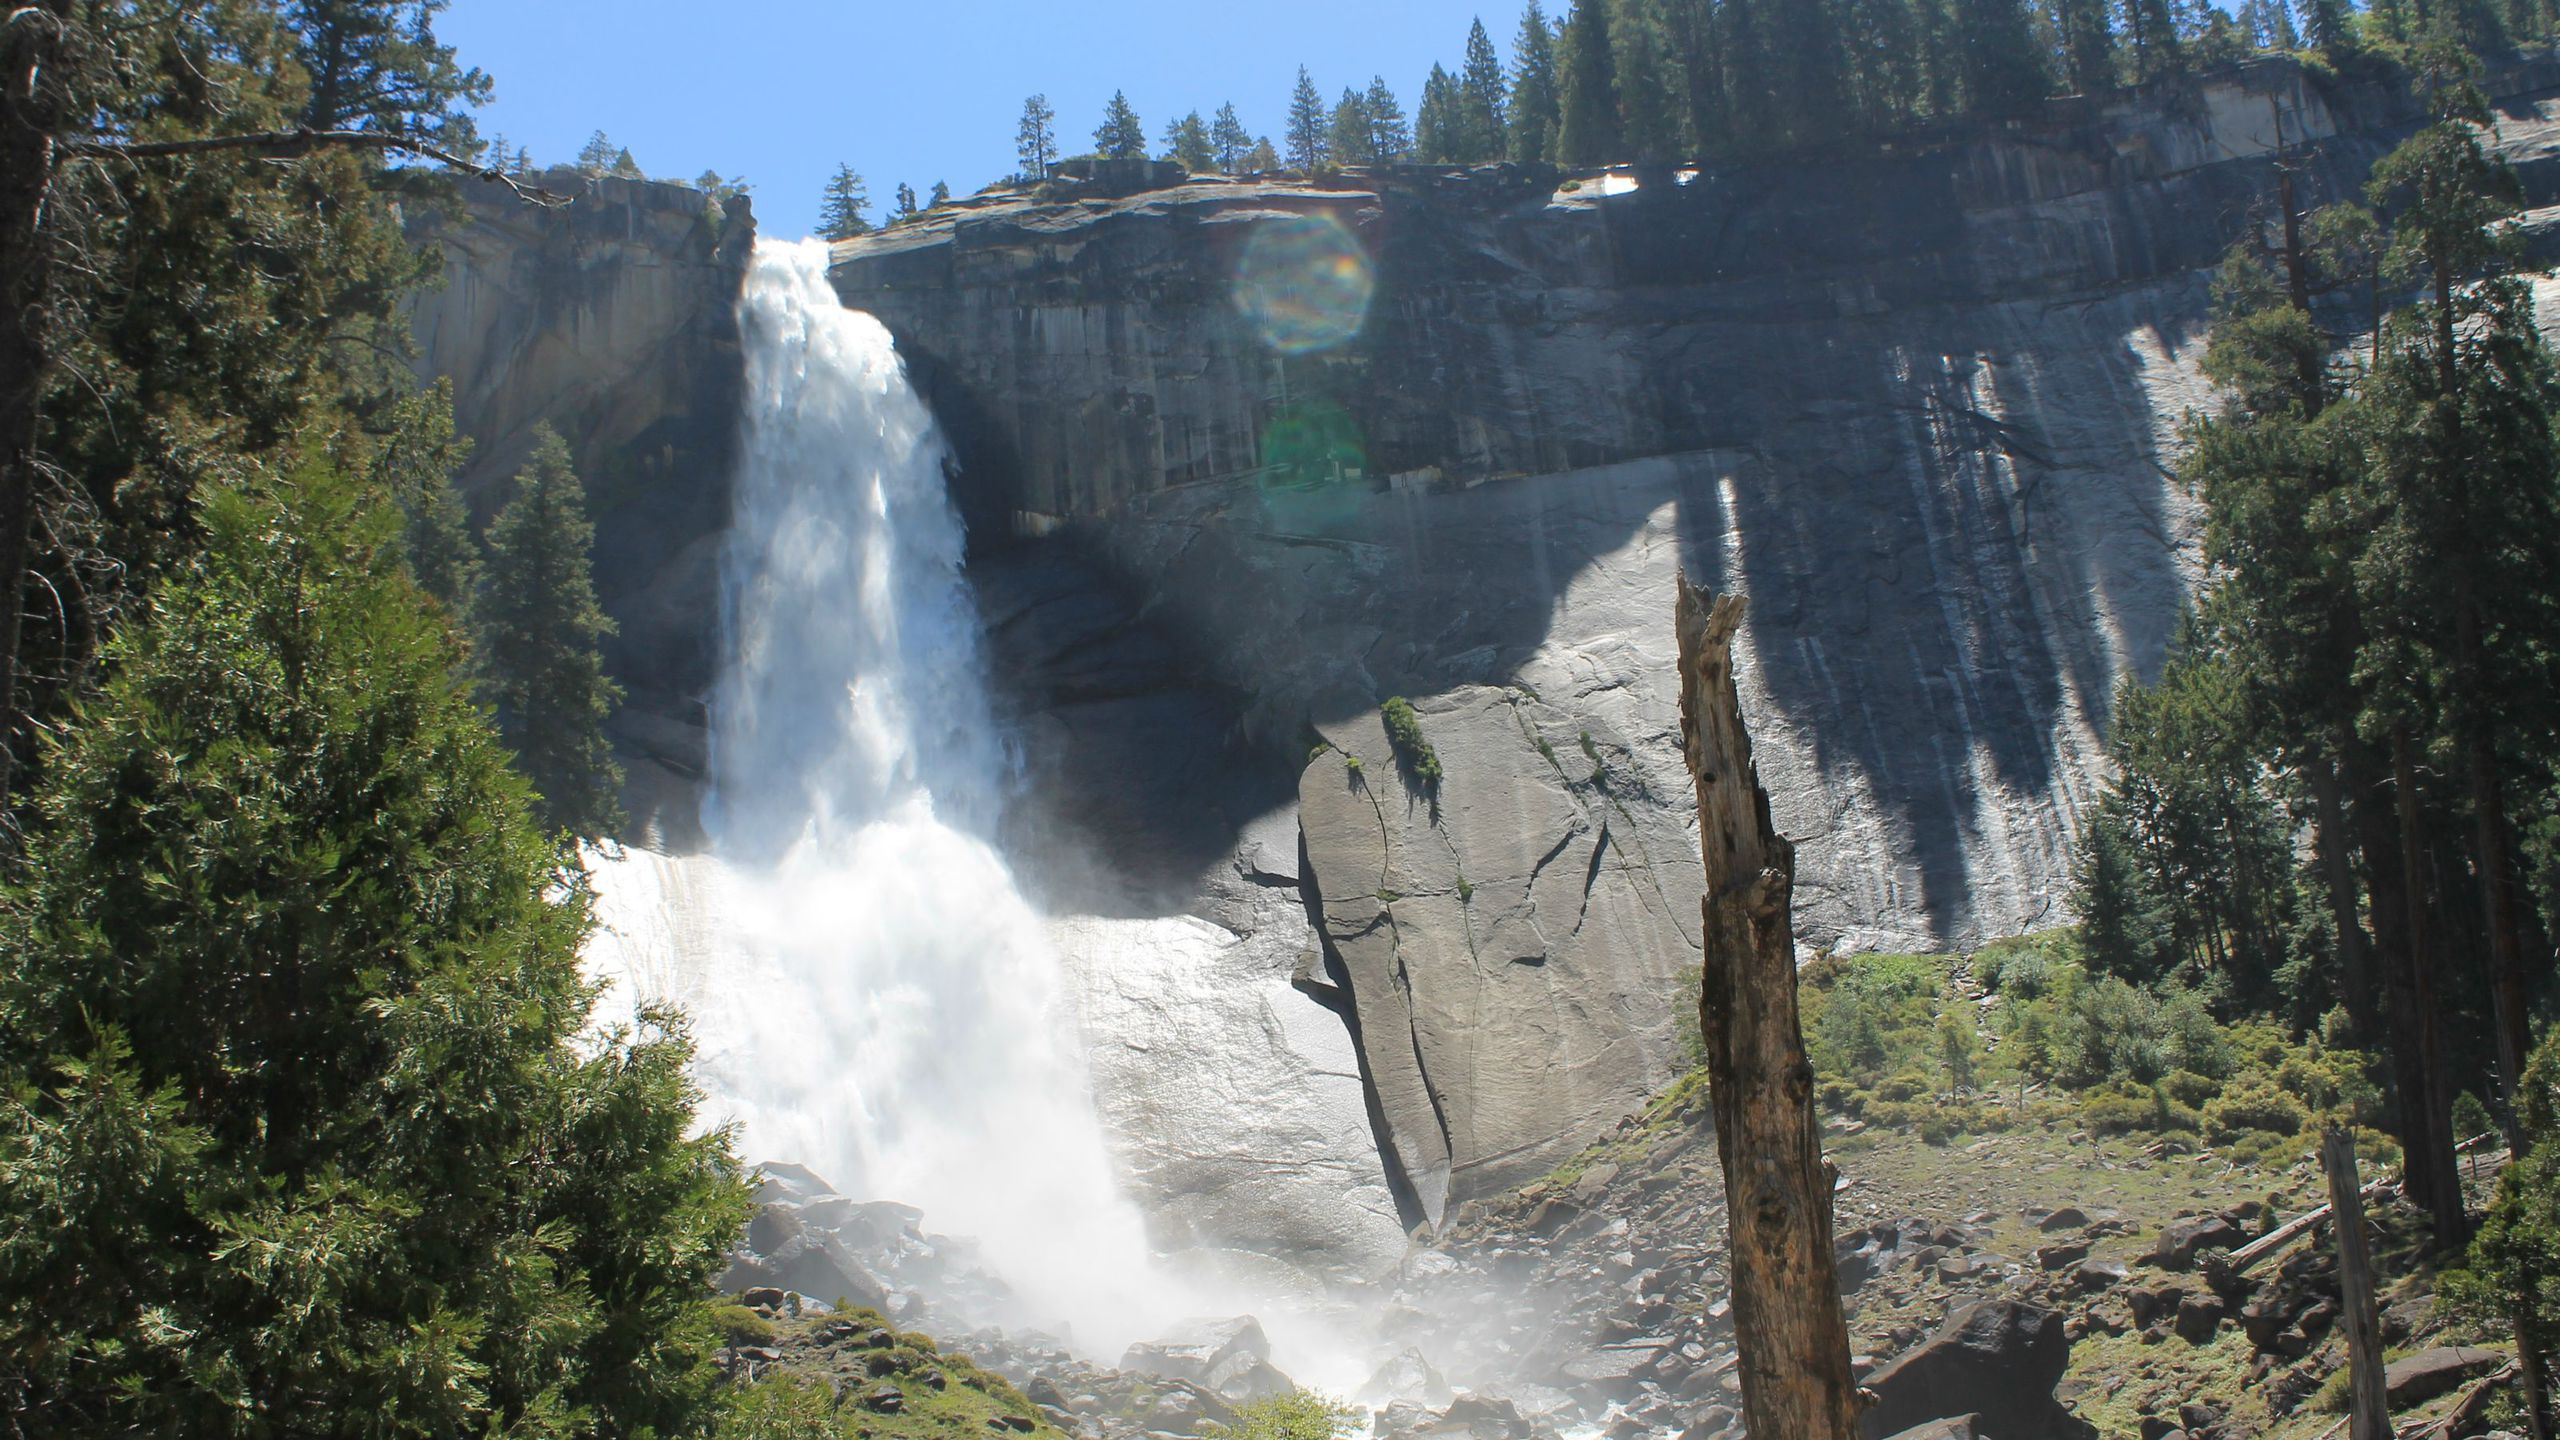 BOTPOST [BOT] Nevada Falls Yosemite National Park USA iimgurcom 2560x1440